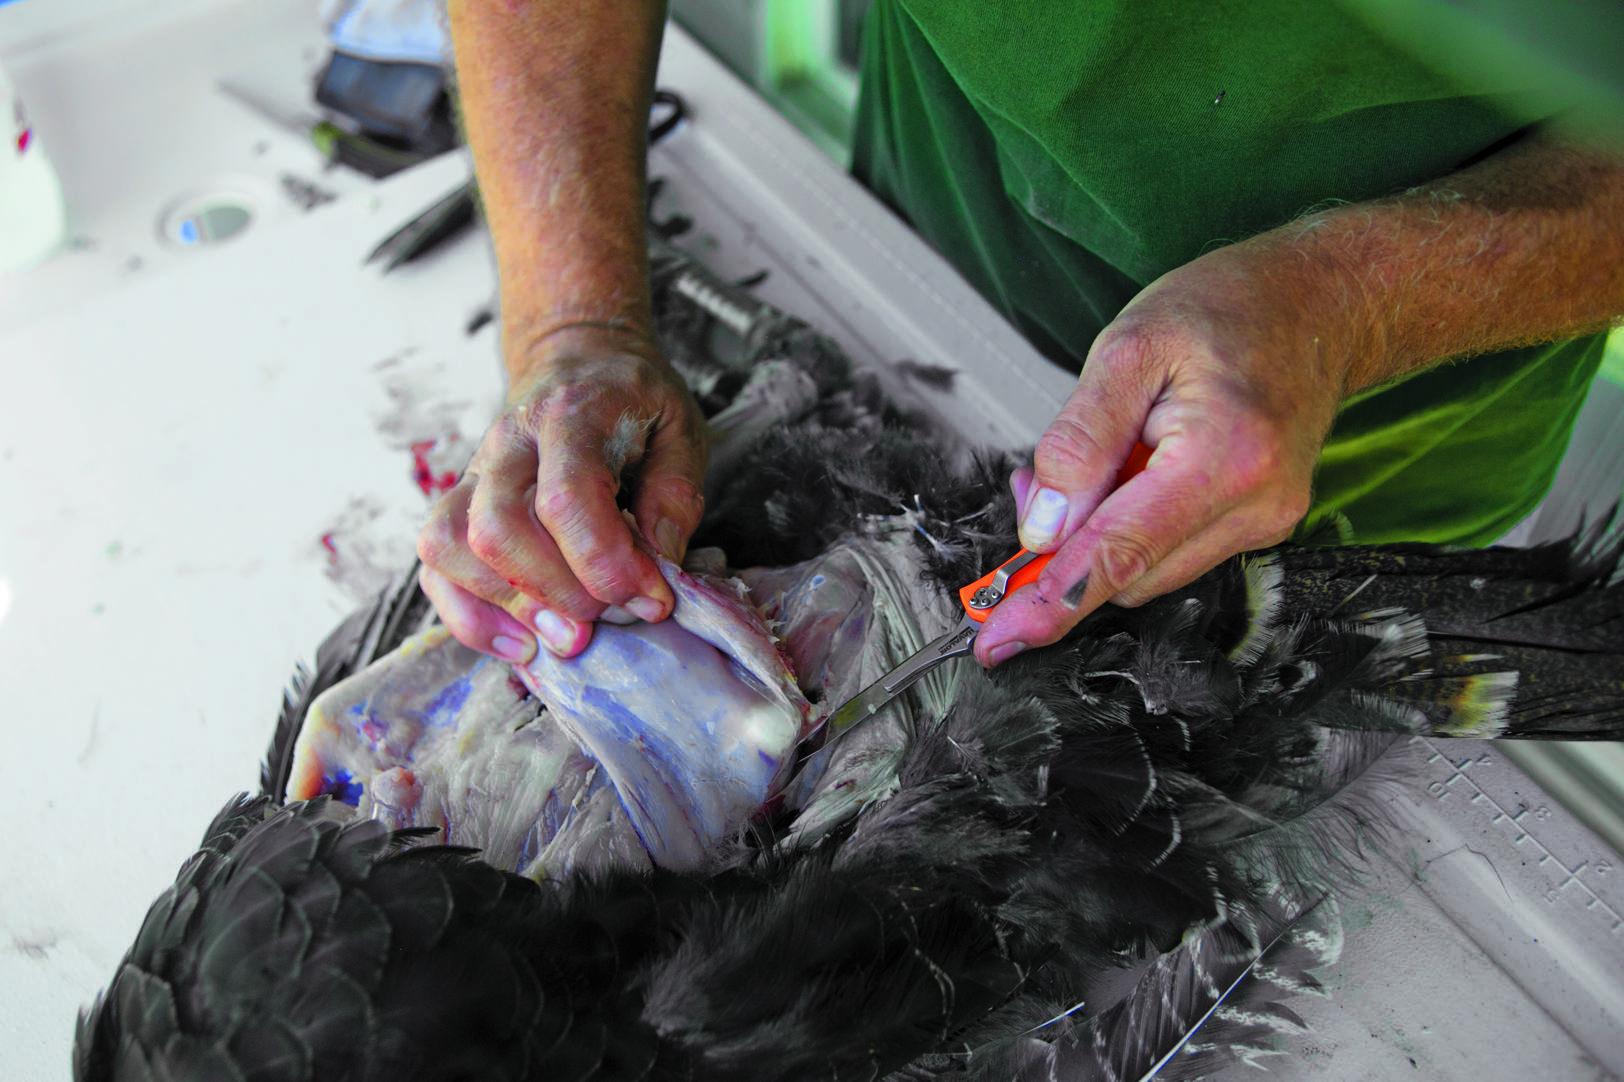 Skinning a Wild Turkey